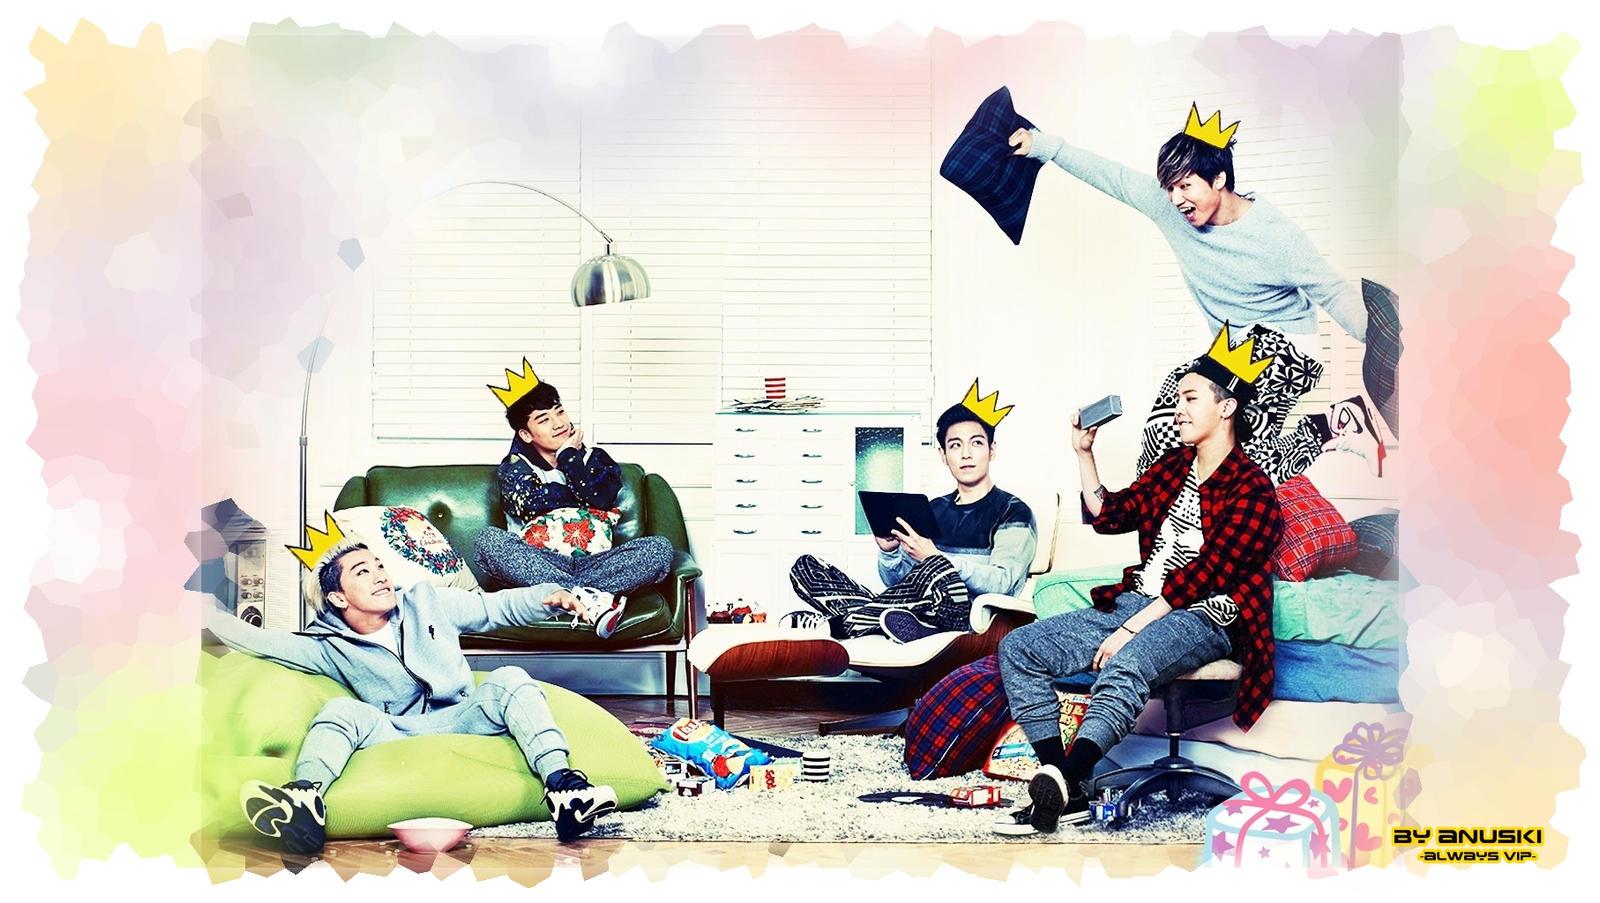 BIGBANG - THE MAGI (THE KINGS) - WALLPAPER by ana-k89